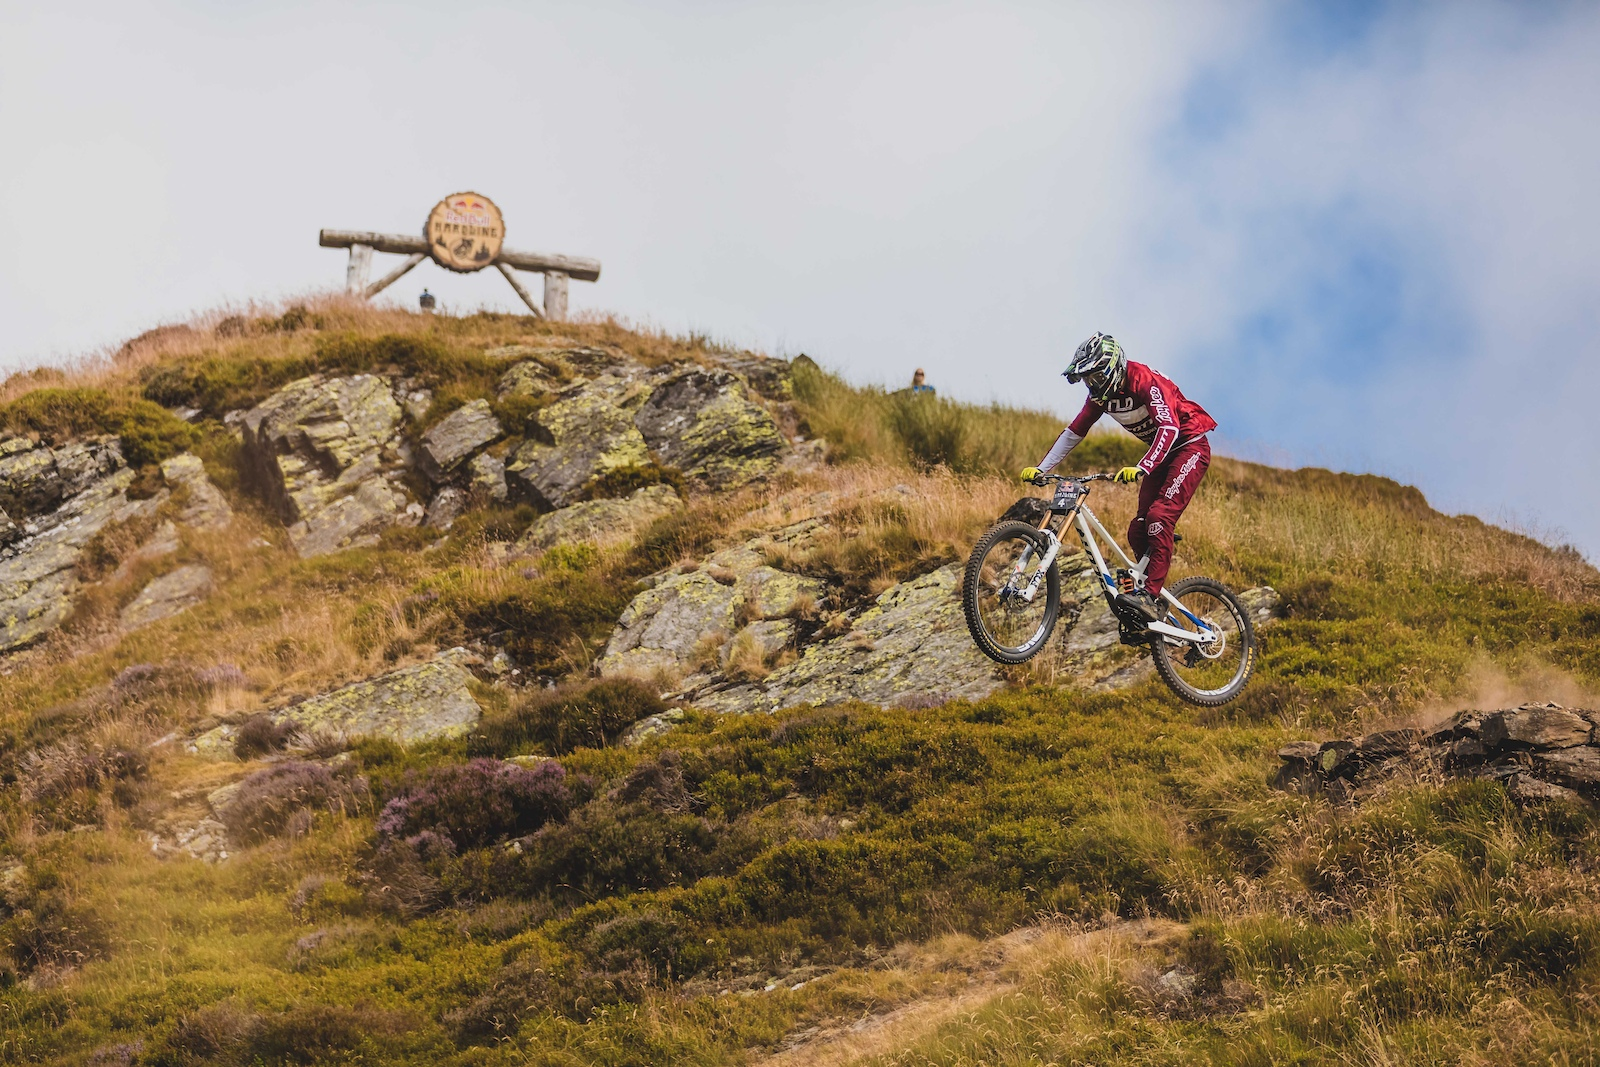 Brendan Fairclough gapping off the top drop.